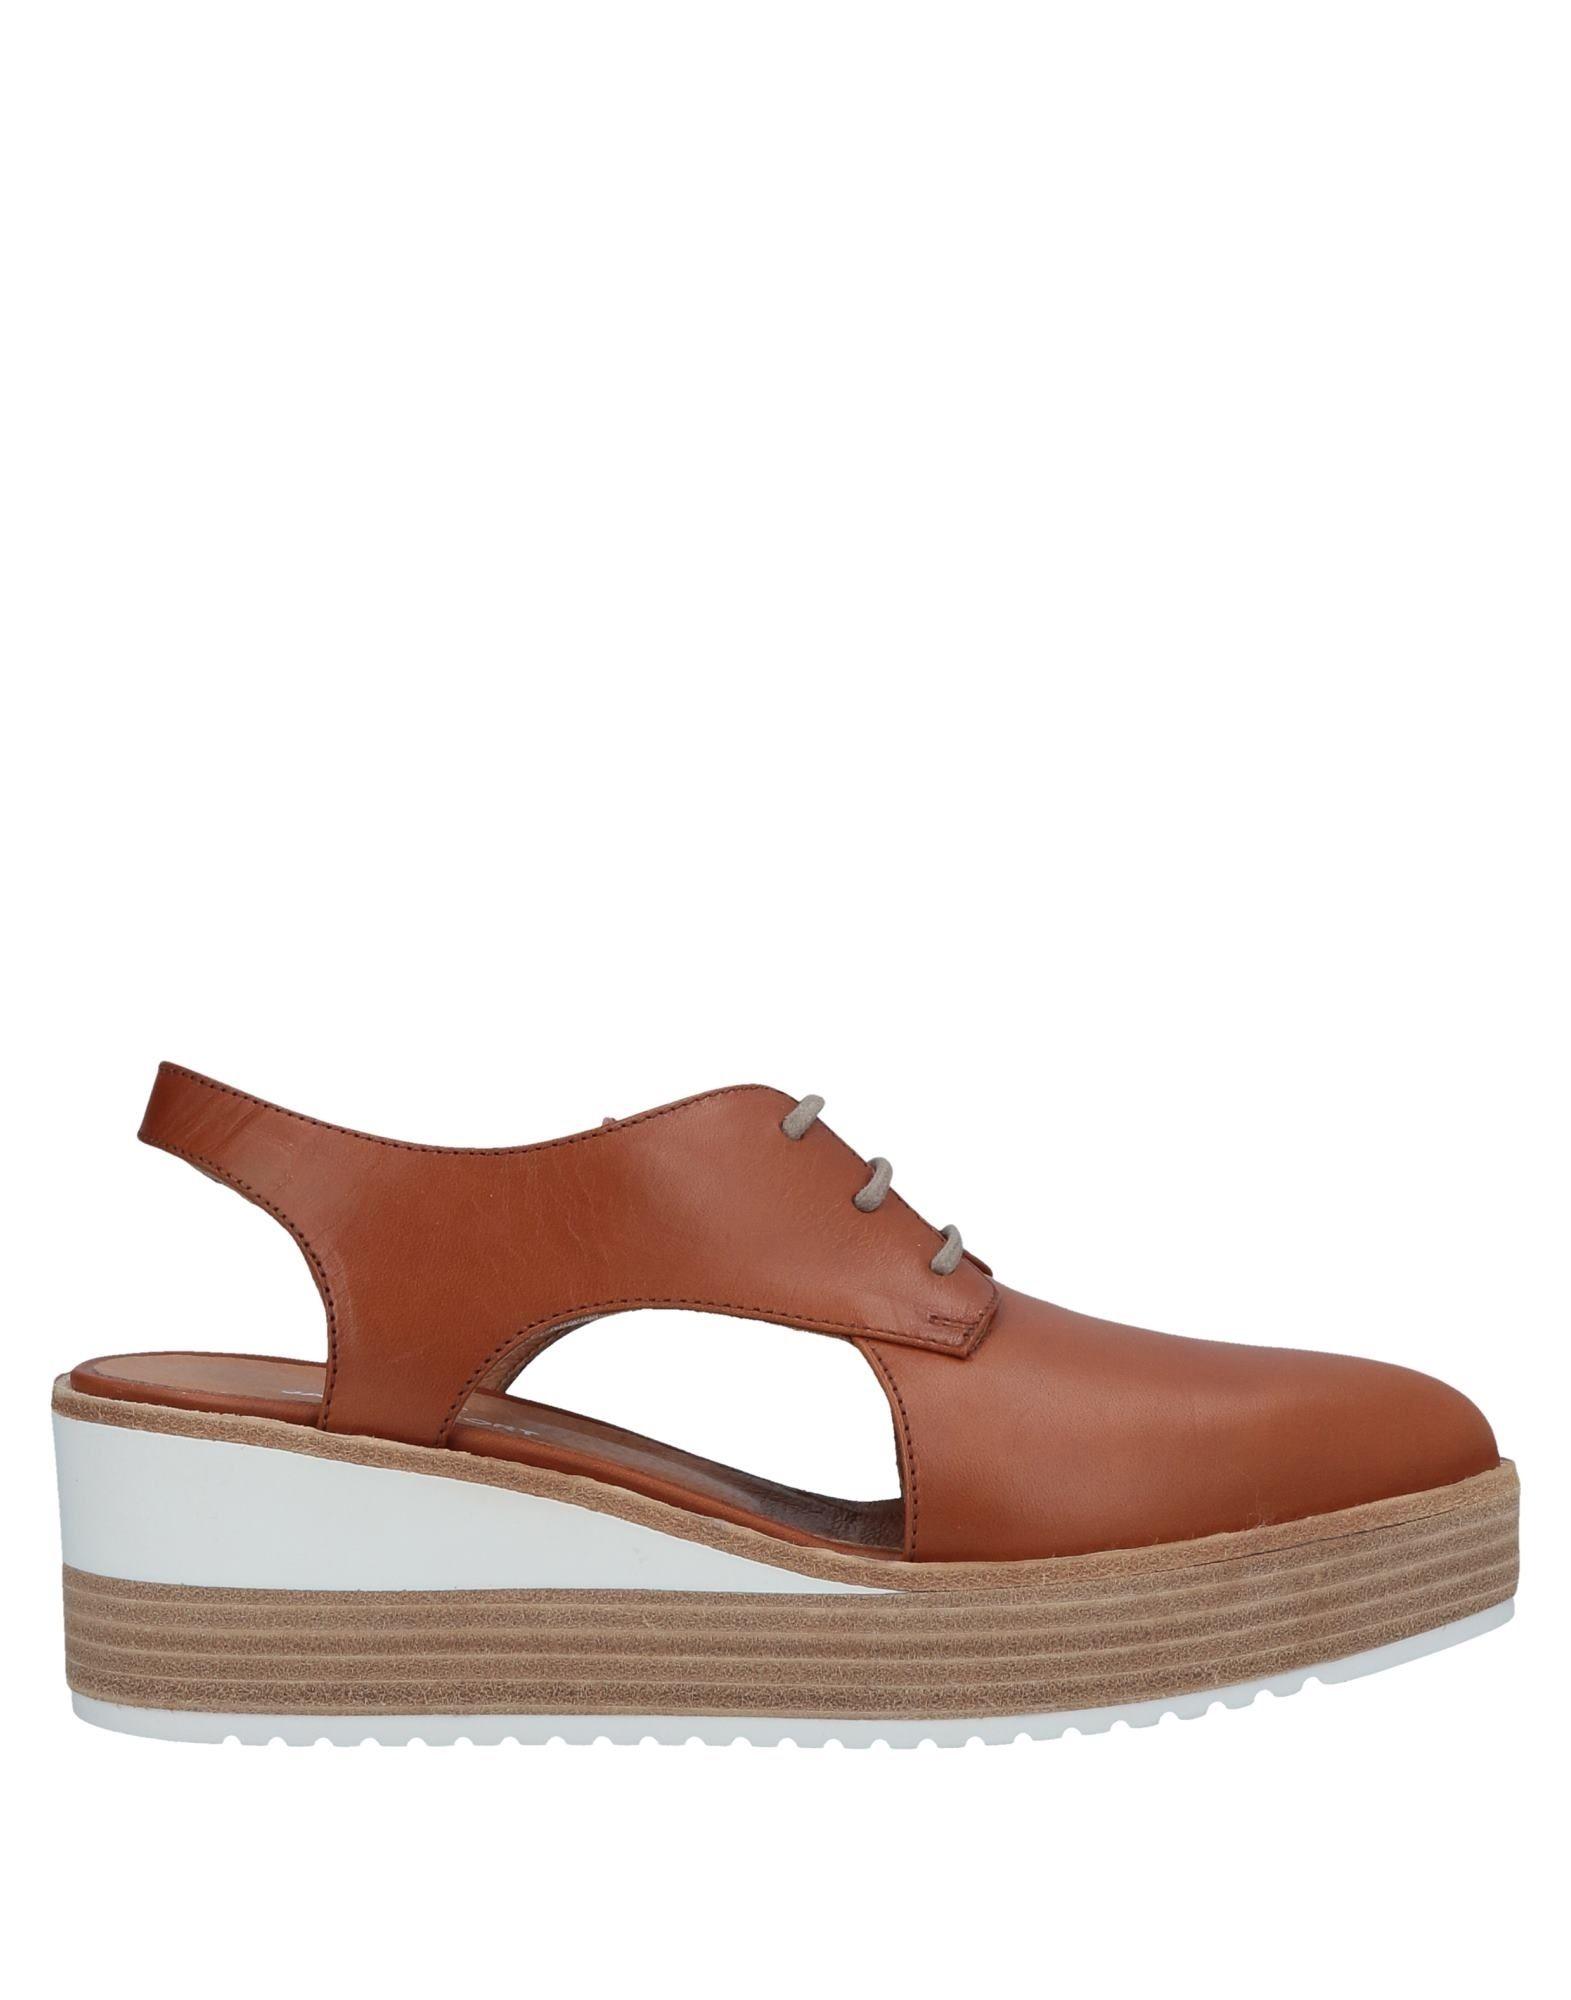 Фото - JANET SPORT Обувь на шнурках peter hadley sport футболка